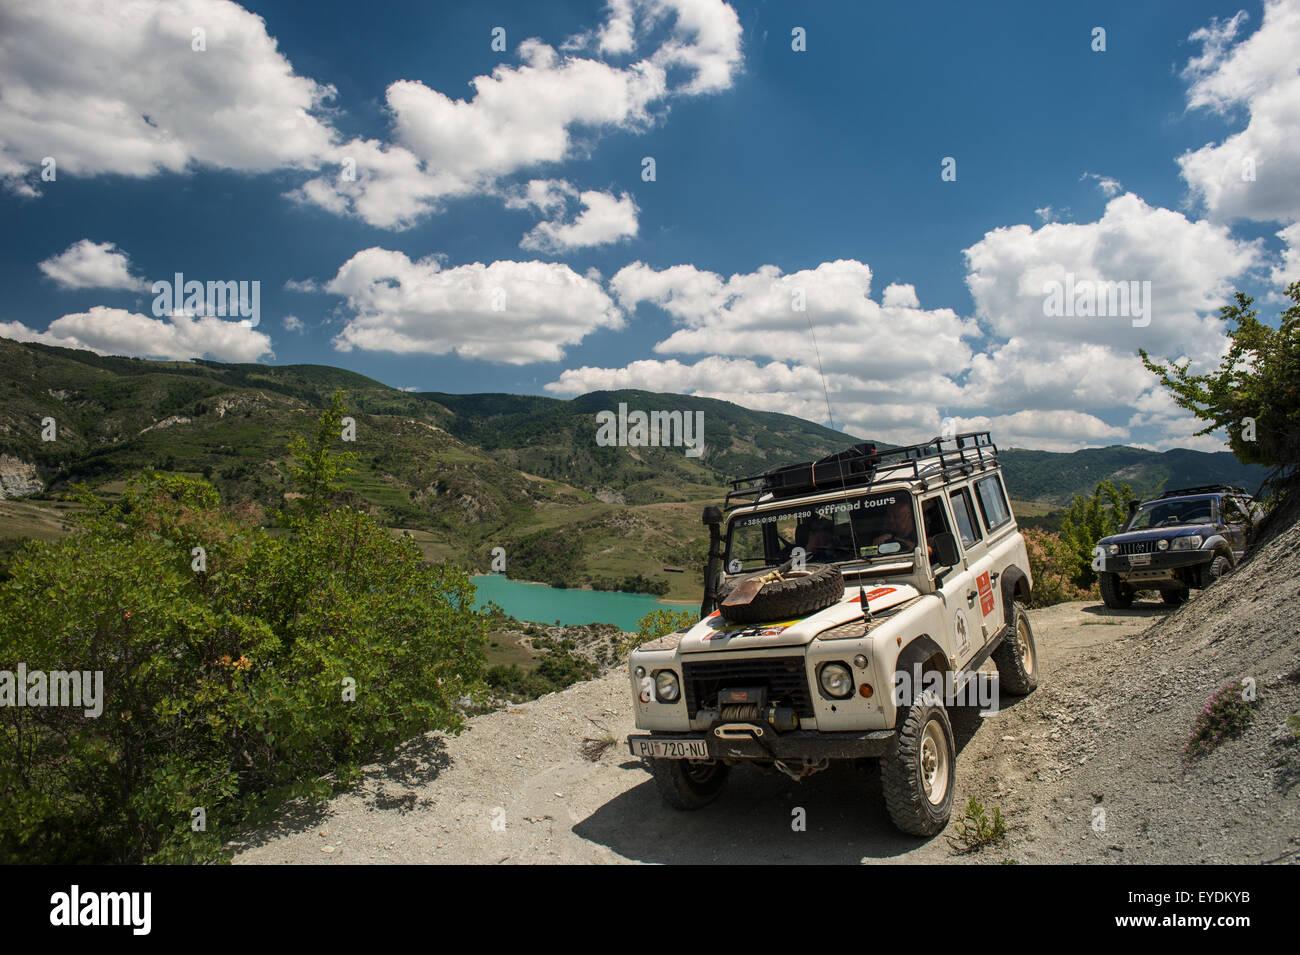 J'Rezervuari Roskovecit Lake, Fier, Albanie Photo Stock